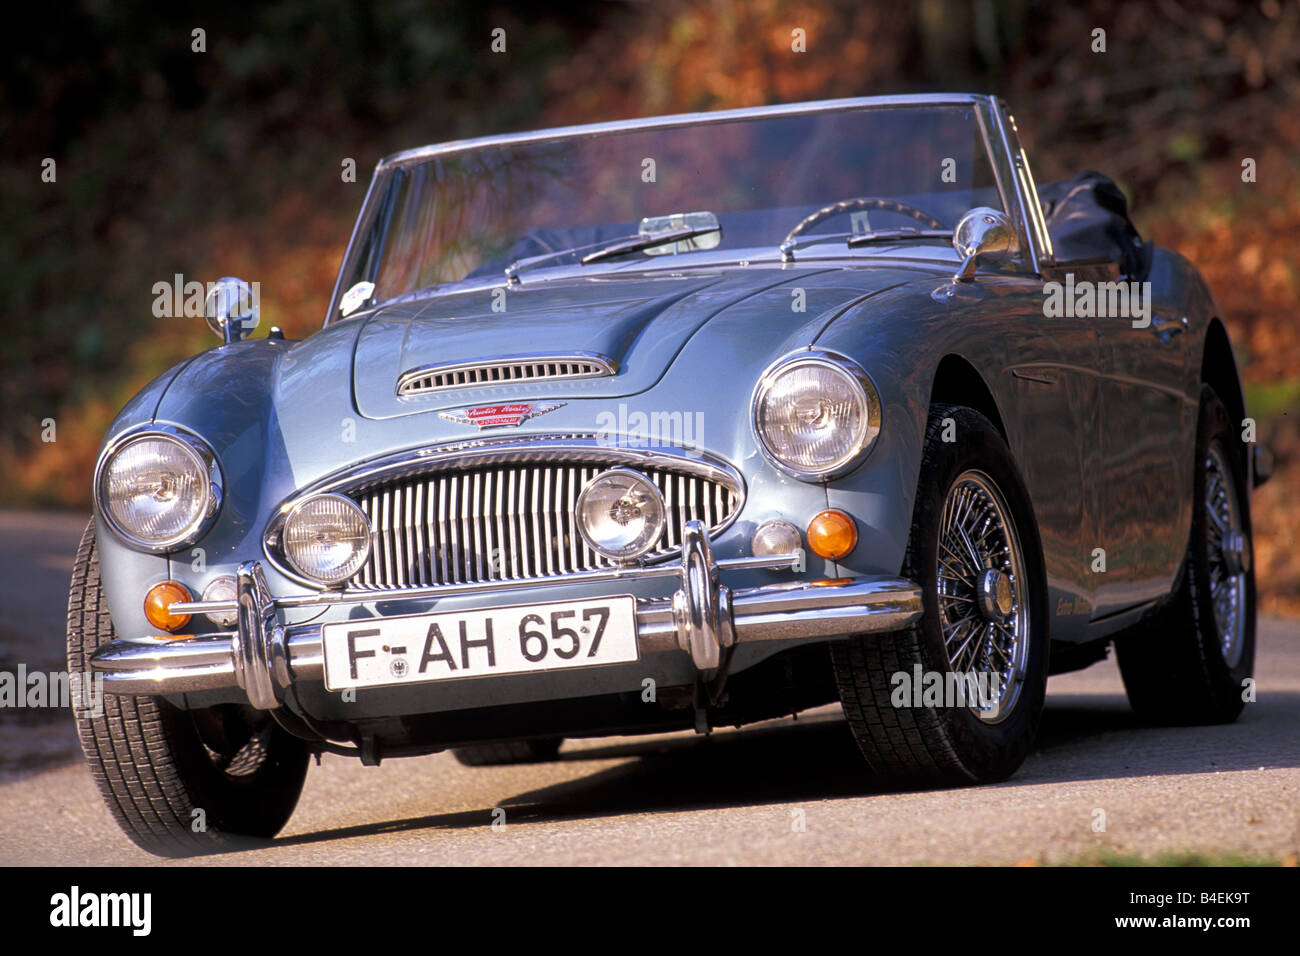 Car, Austin Healey 3000 MK III, convertible, vintage car, model year 1963-1968, this car model year 1964, silver, - Stock Image